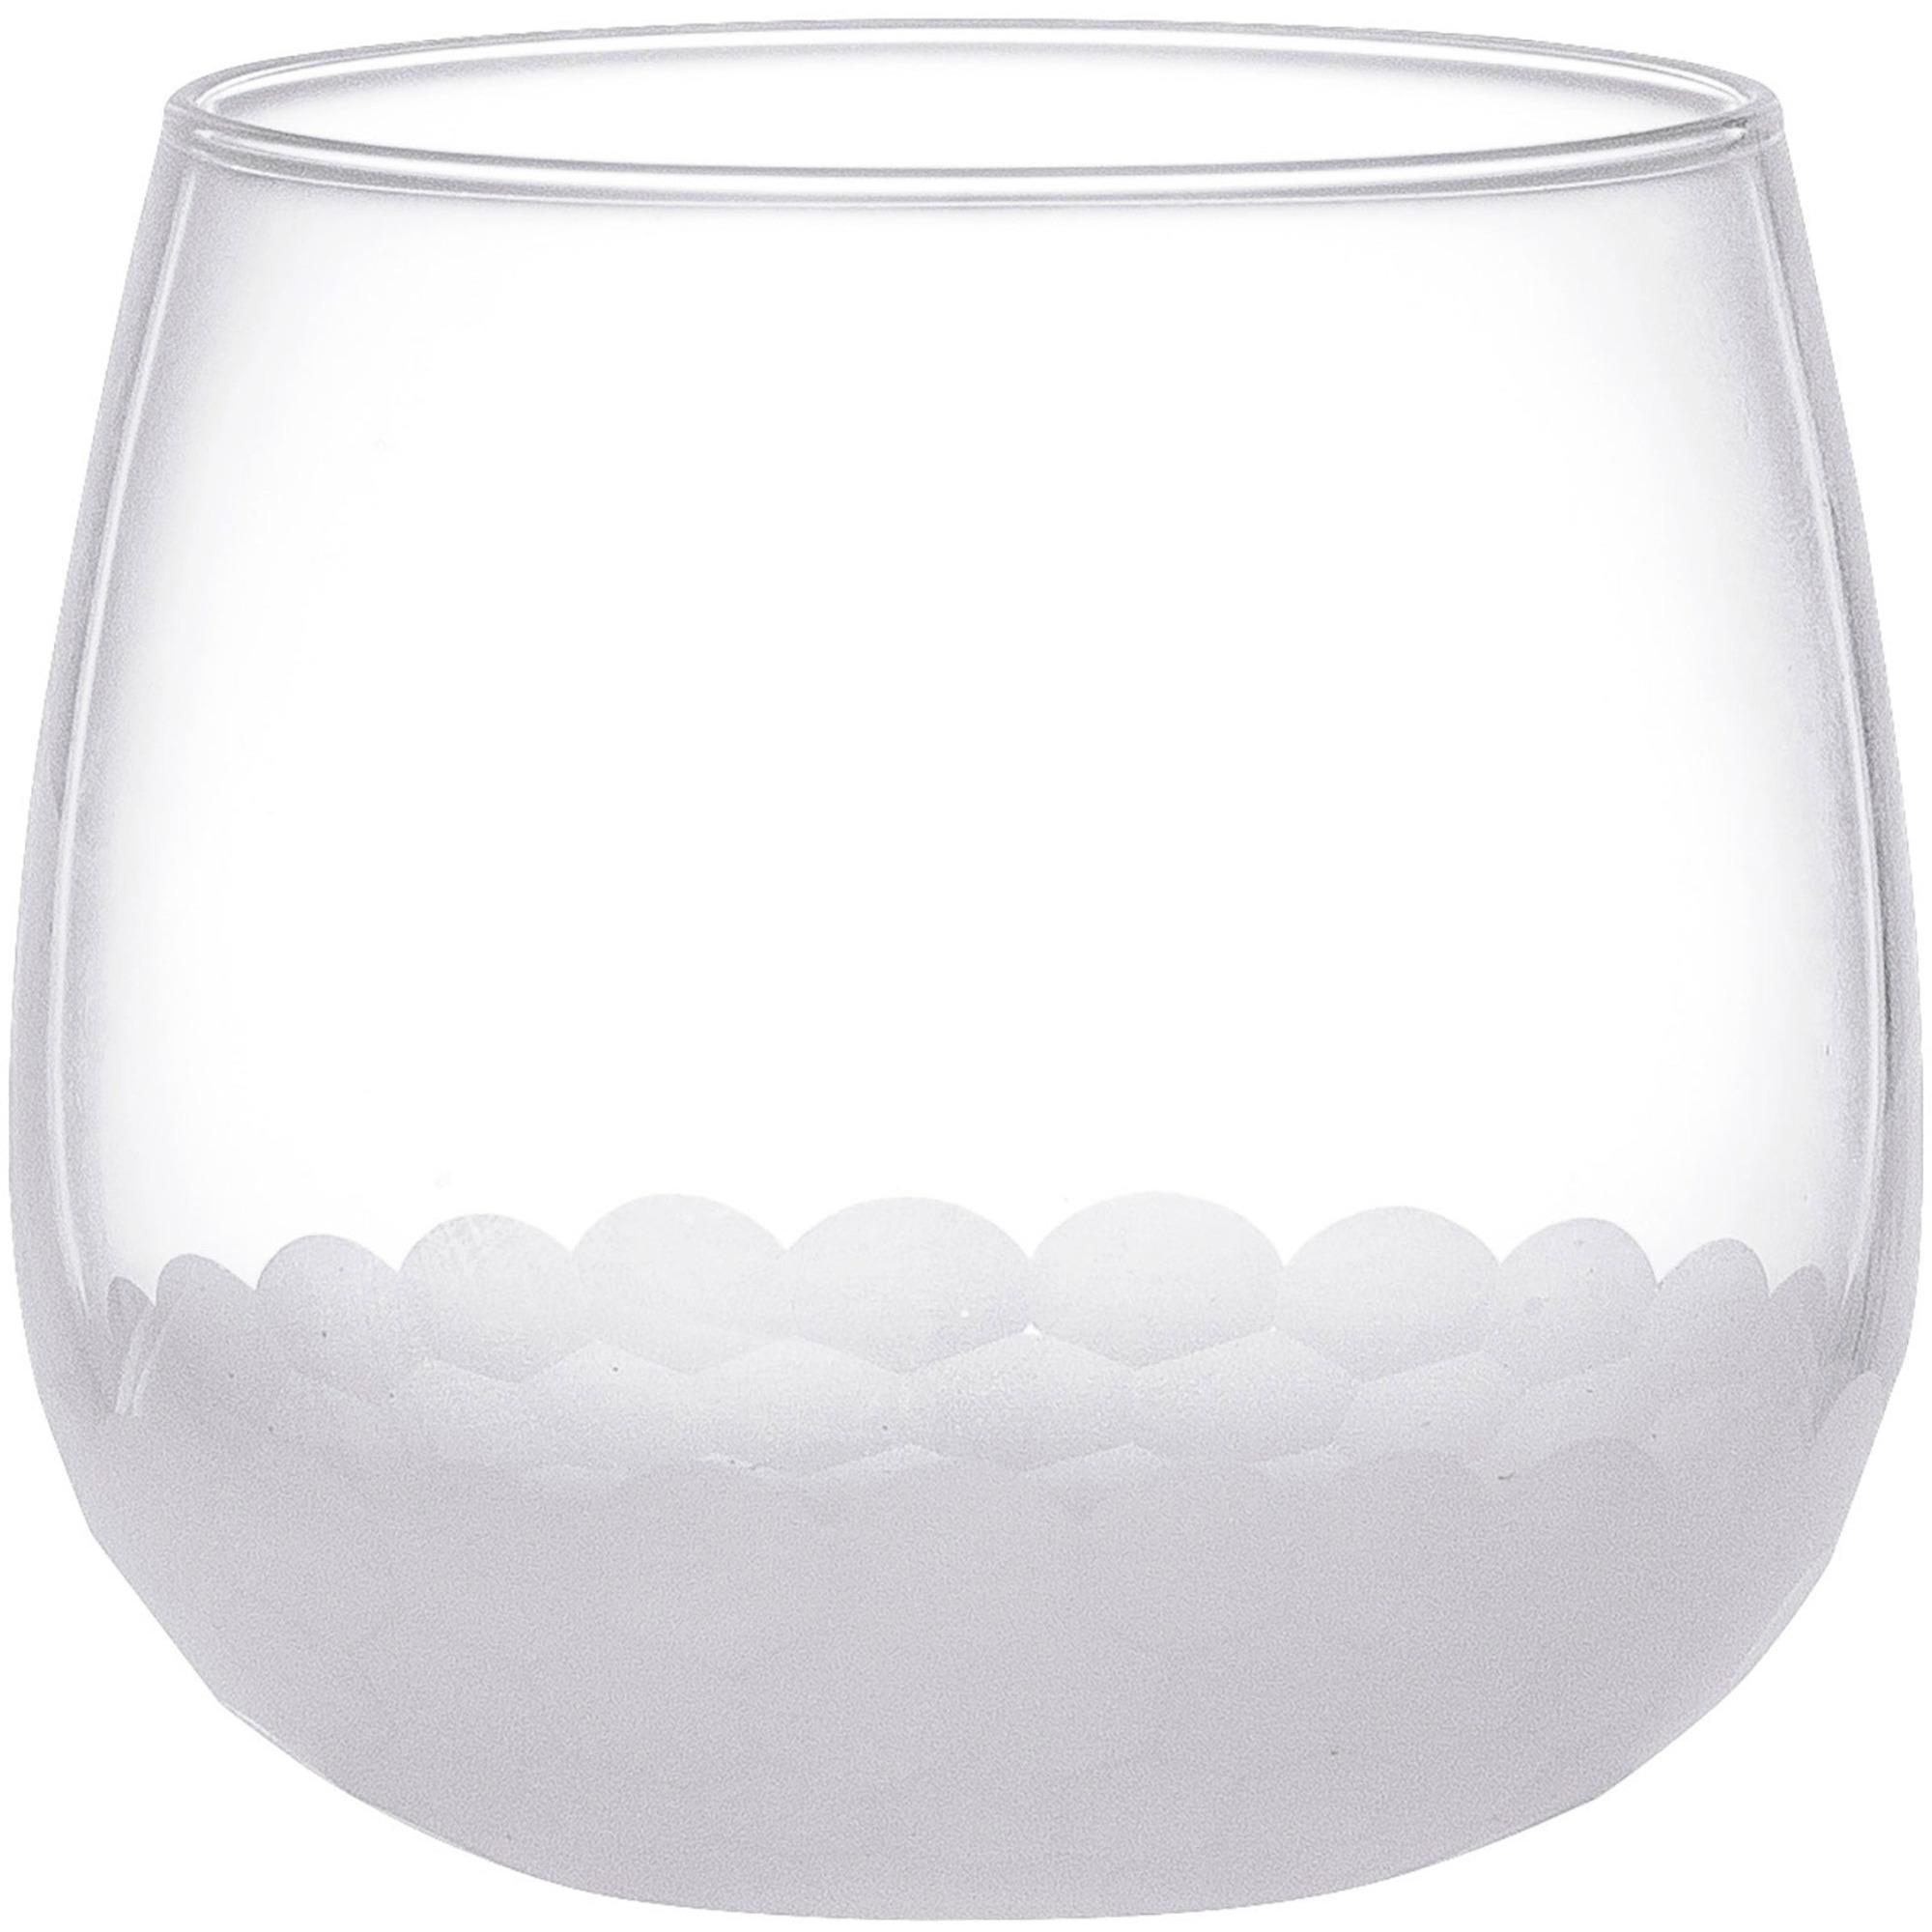 Bloomingville Glas 8 cm. klar